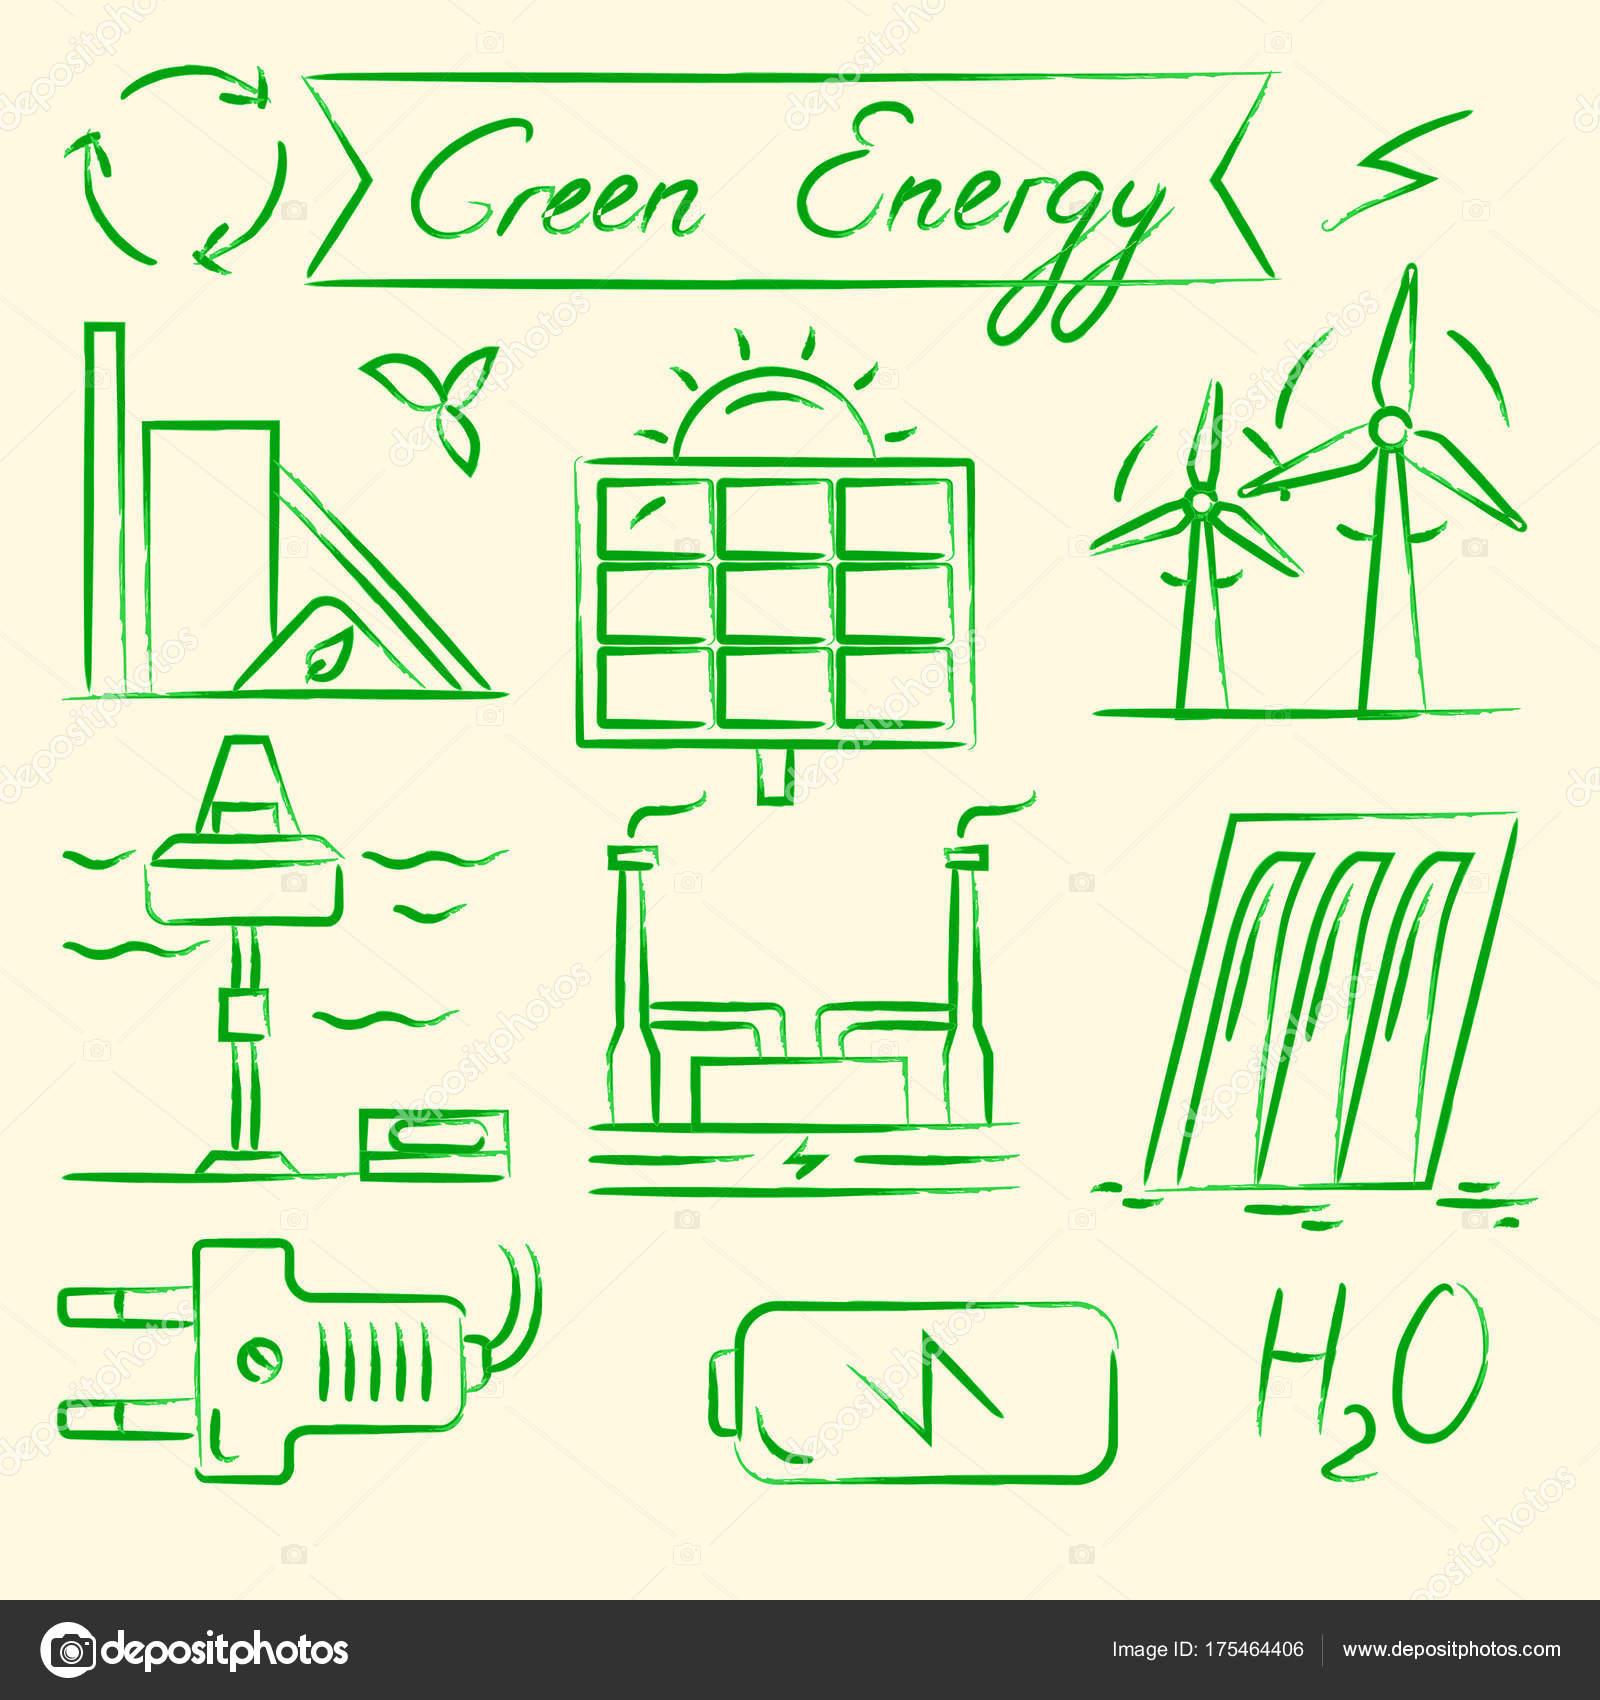 Set di icone disegnate a mano di energia rinnovabile vettoriali stock ekazansk 175464406 - Diversi tipi di energia ...